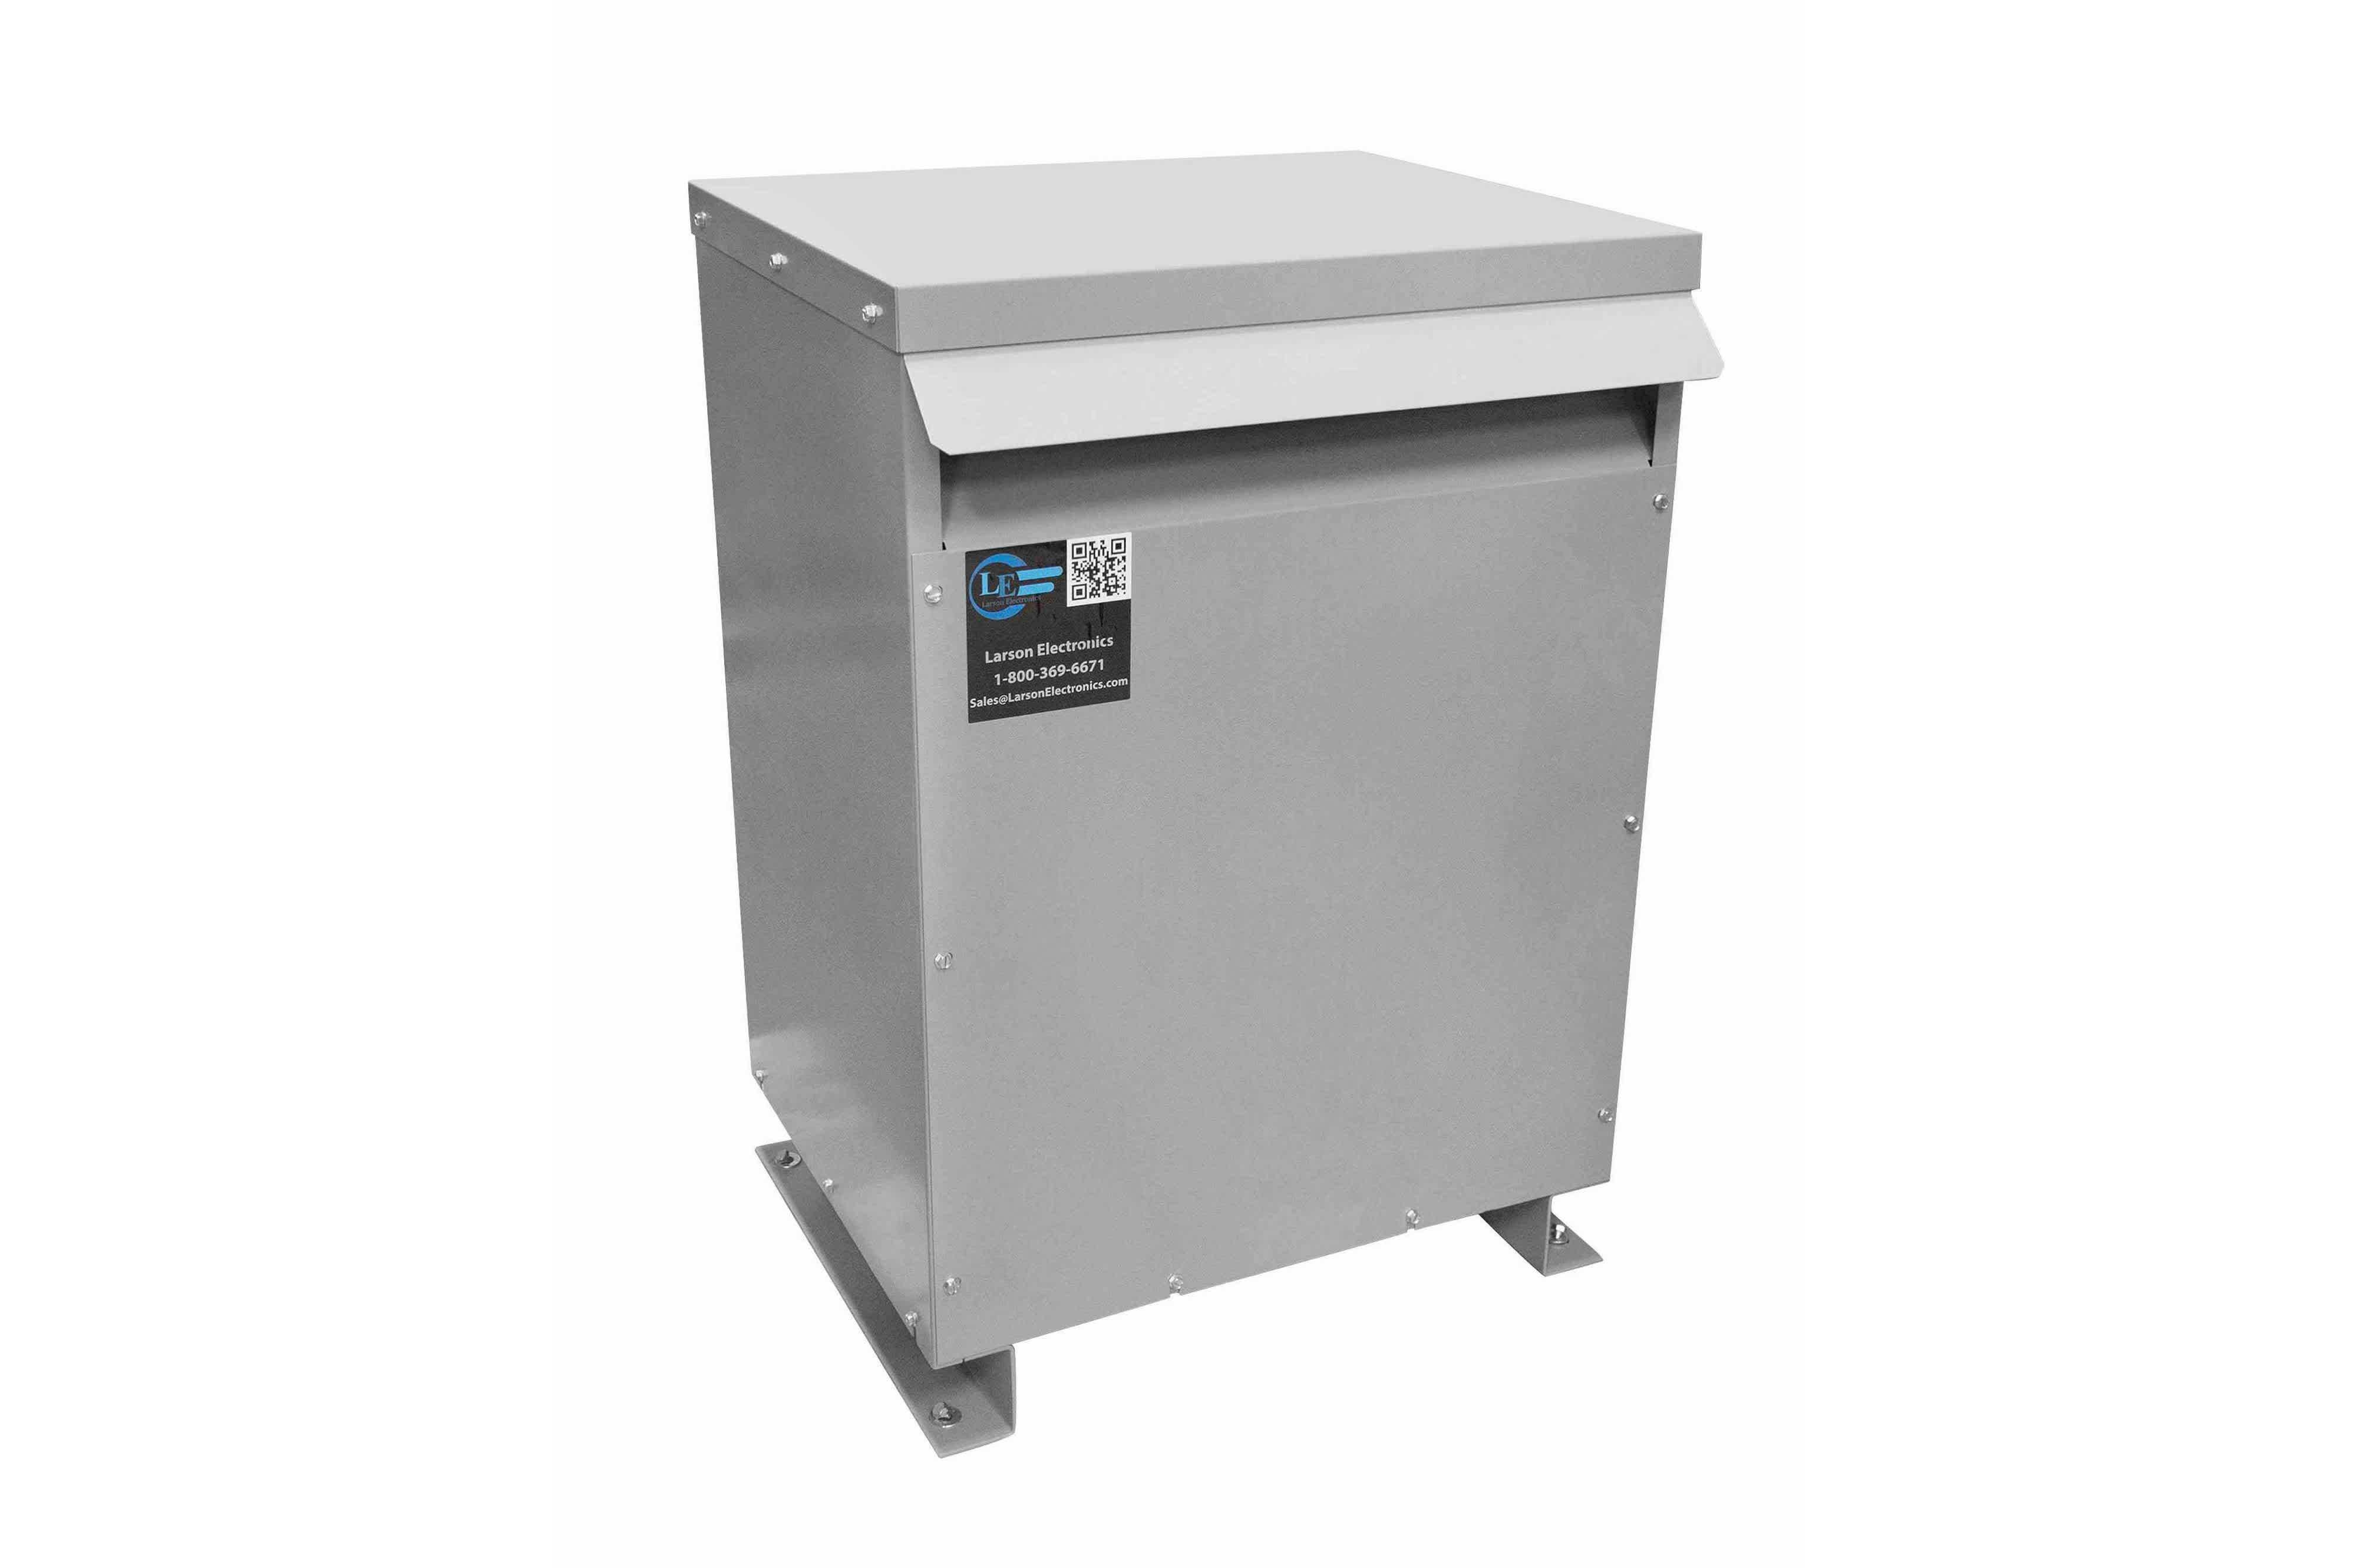 14 kVA 3PH Isolation Transformer, 400V Wye Primary, 600V Delta Secondary, N3R, Ventilated, 60 Hz